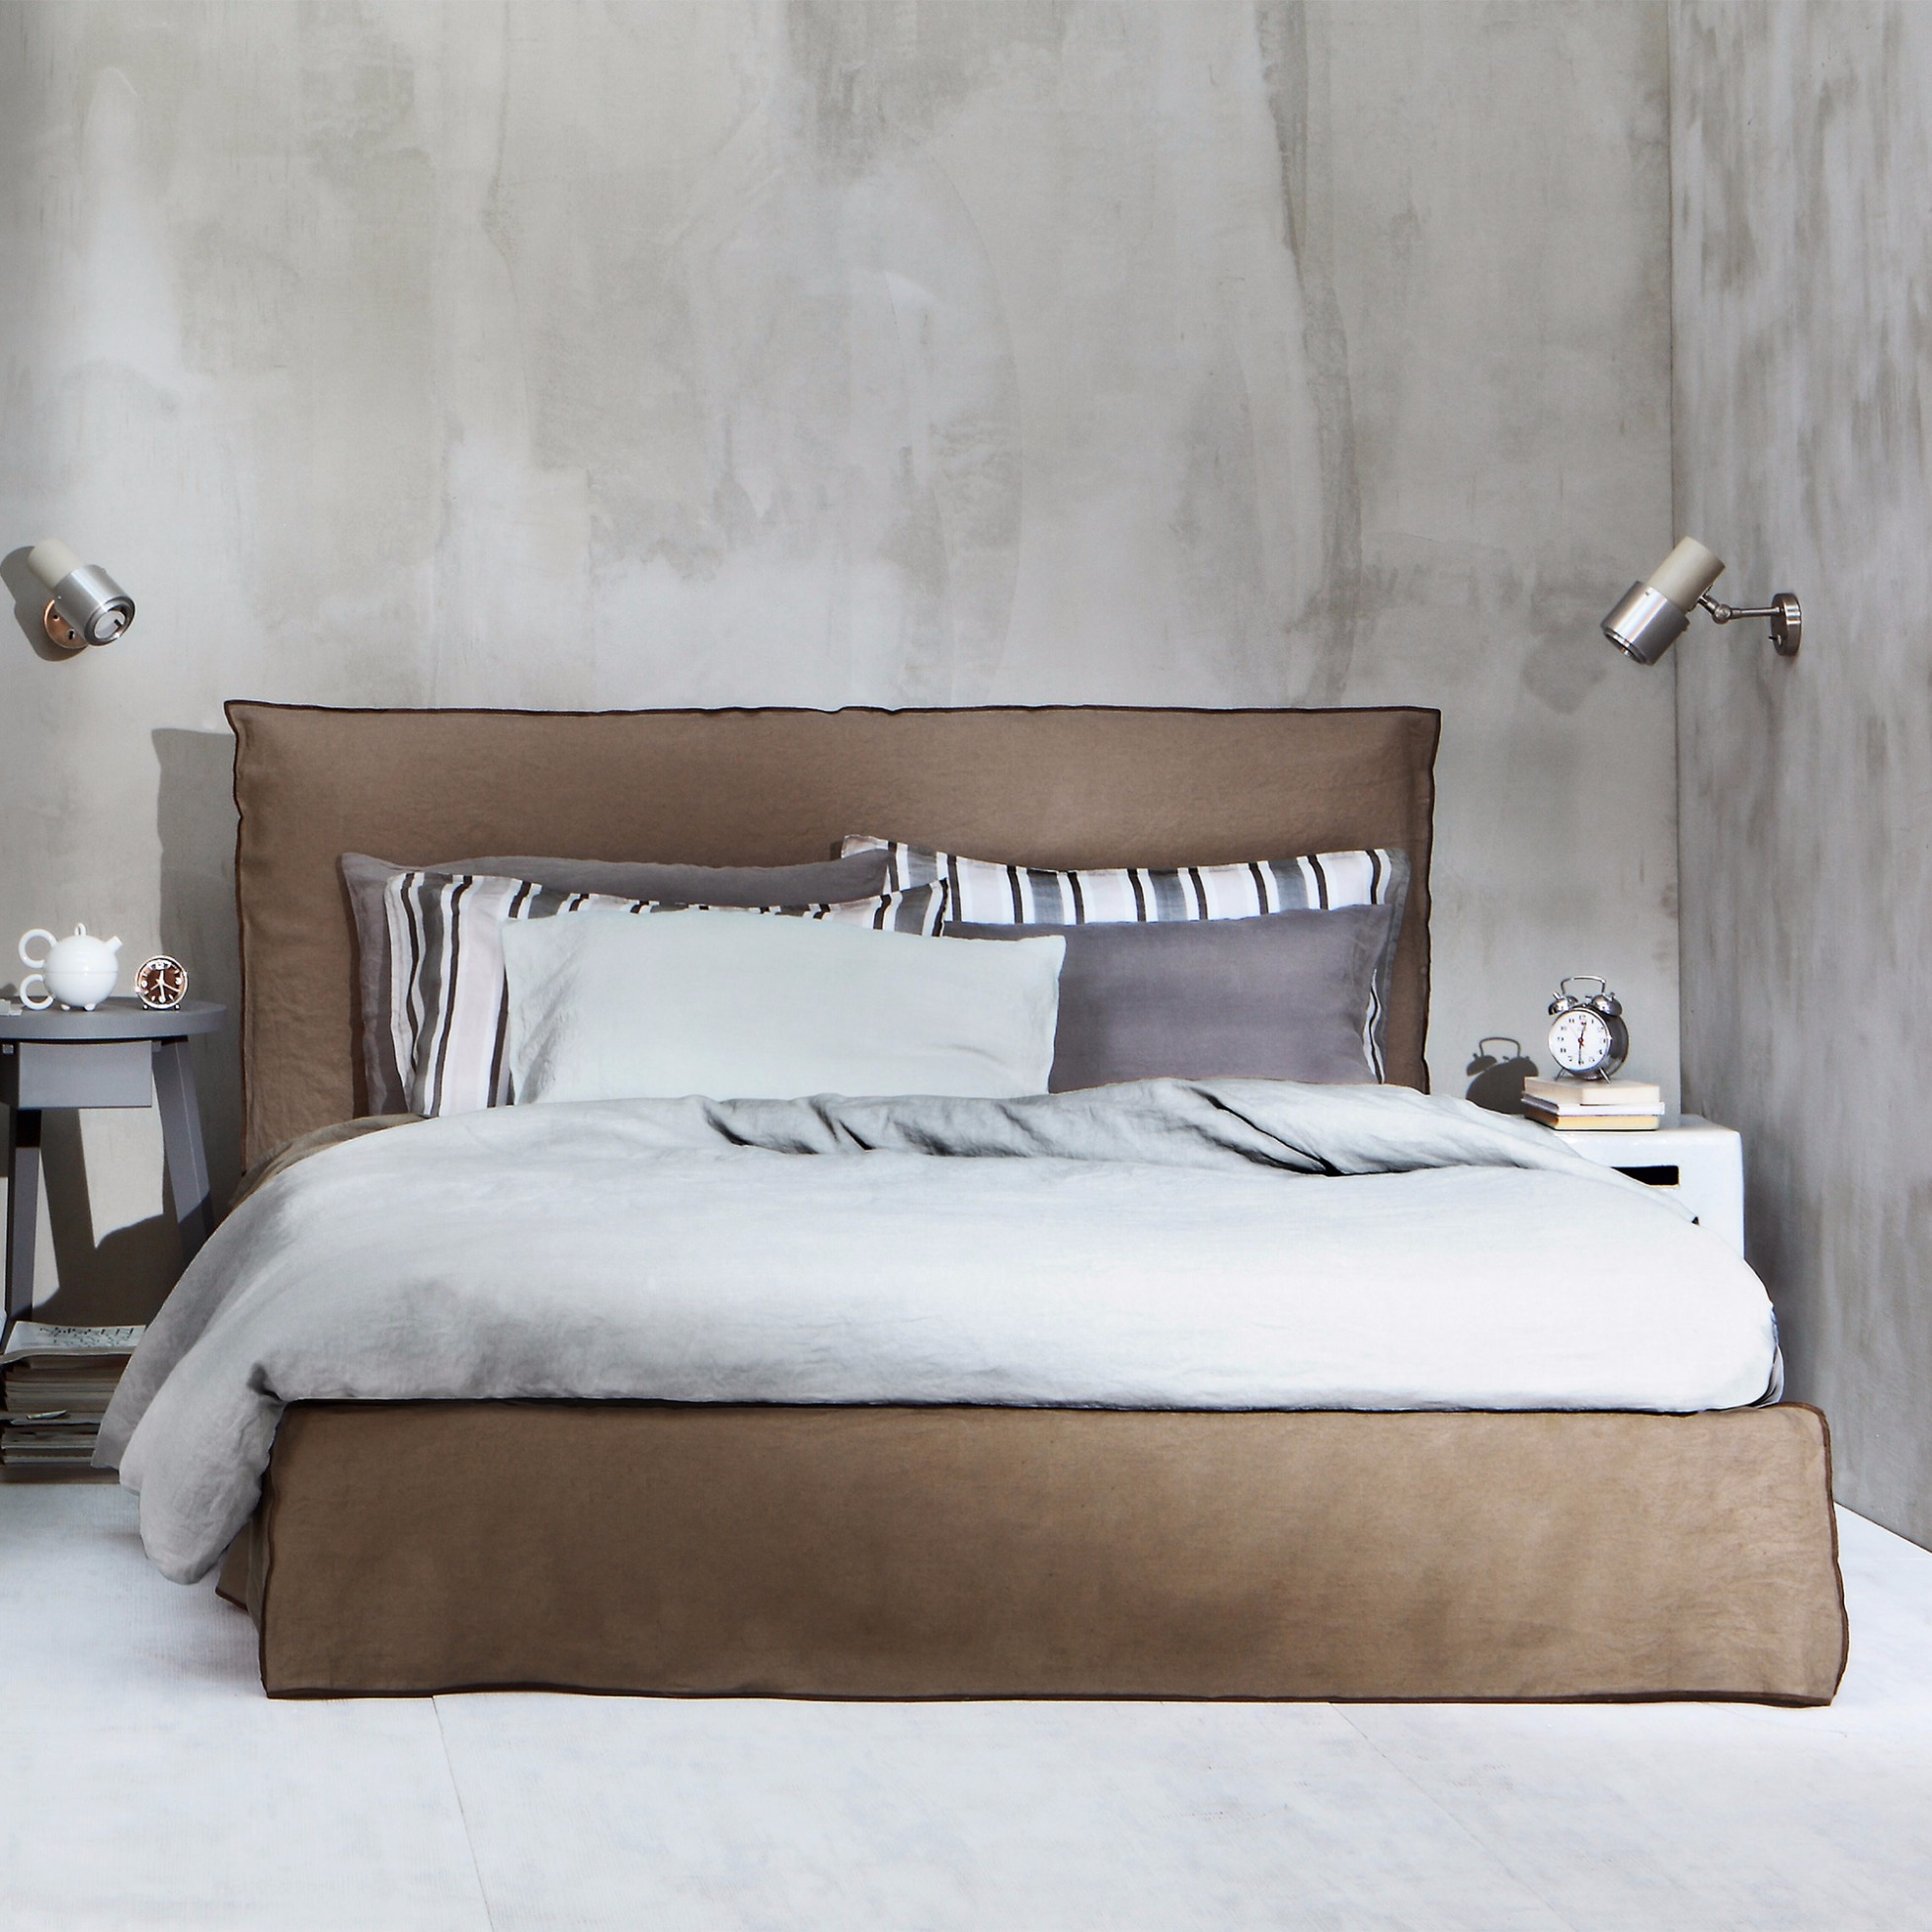 doppelbett 200x200 best doppelbett 200x200 with. Black Bedroom Furniture Sets. Home Design Ideas